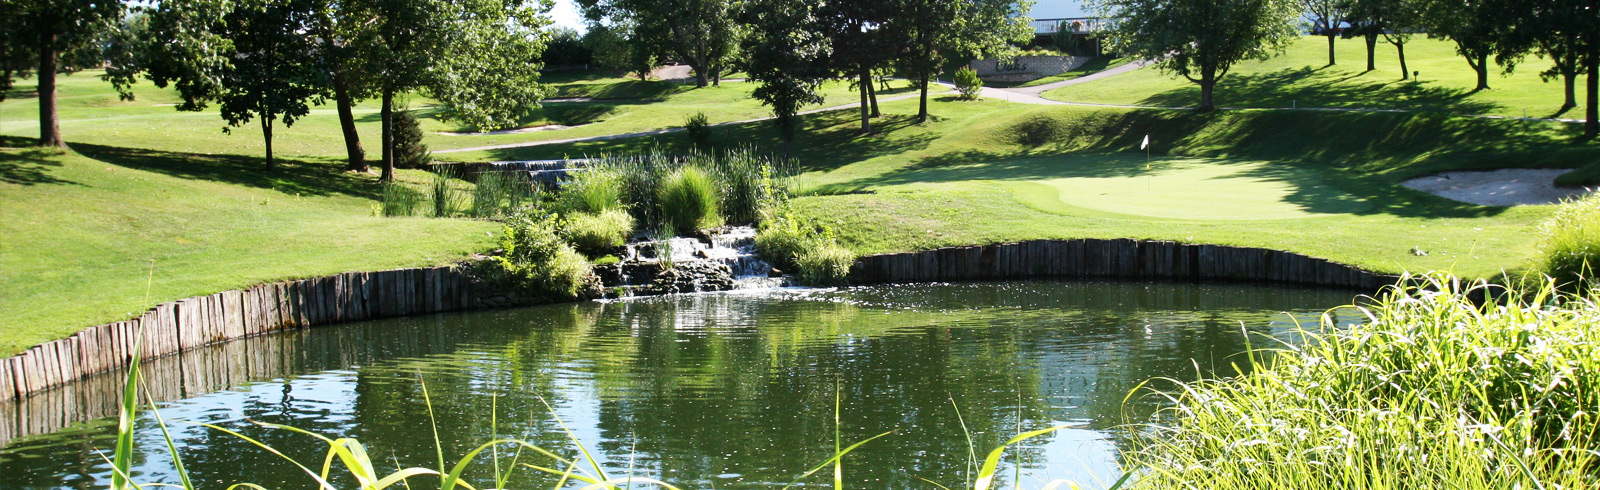 Margaritaville Lake Resort Lake of the Ozarks - Golf Memberships